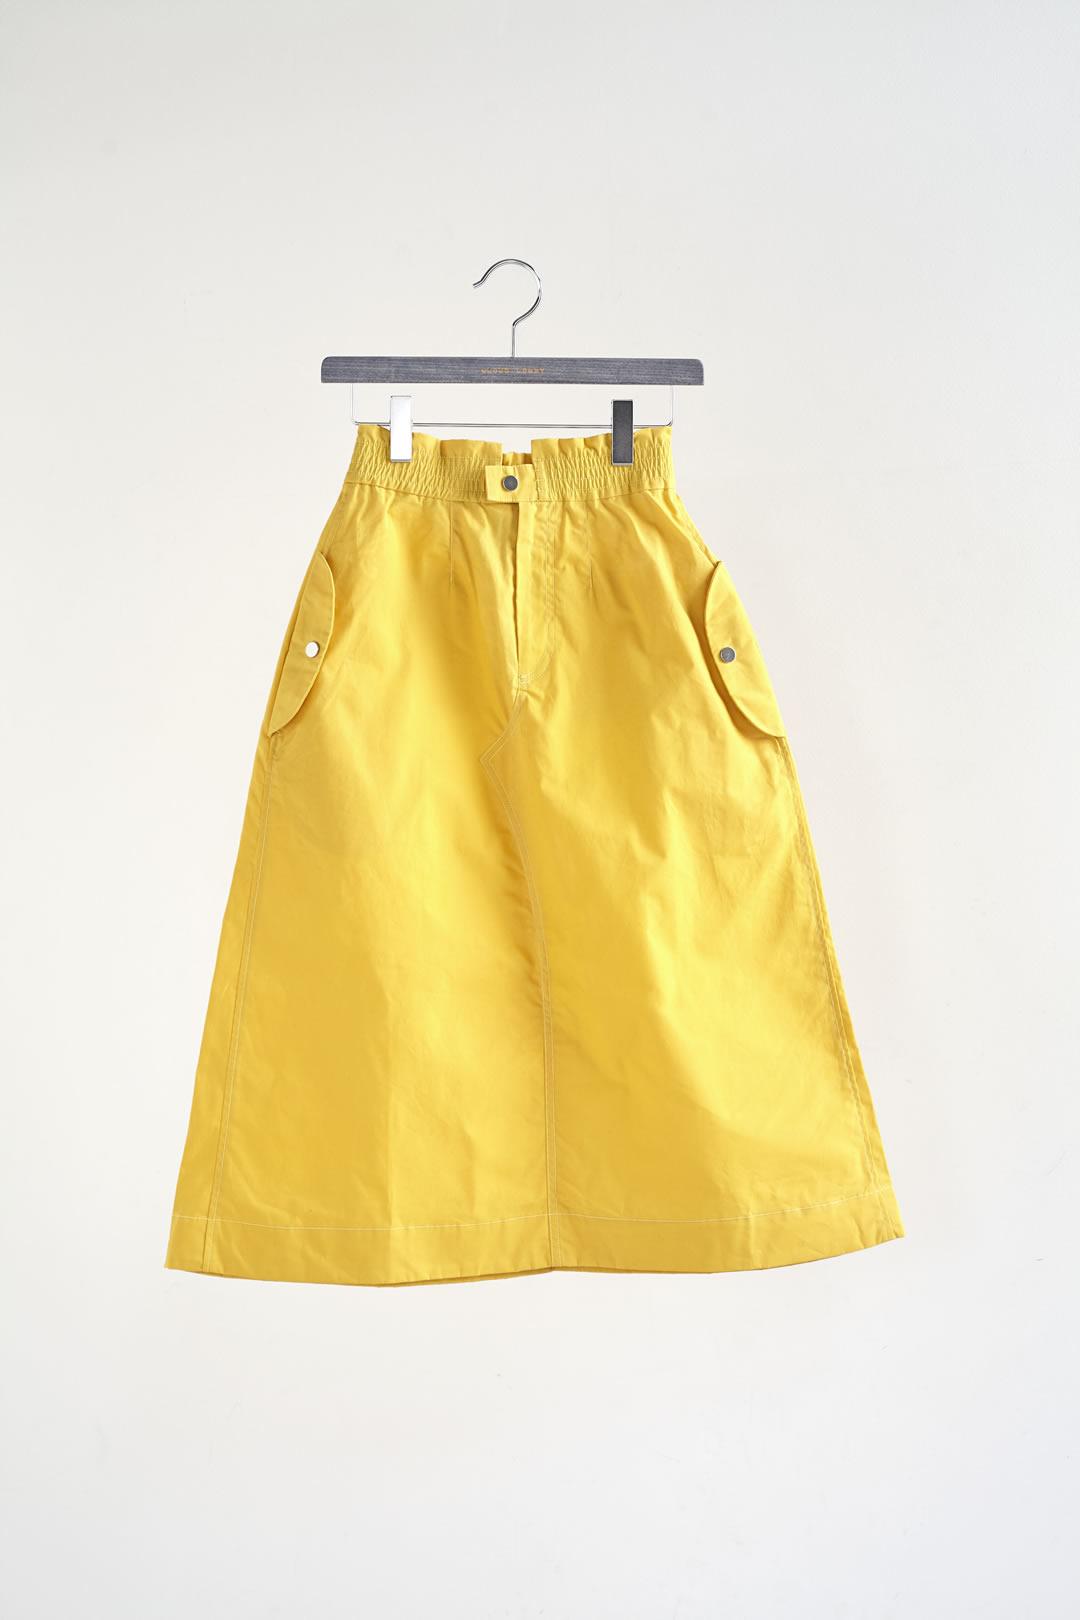 model.5 yellow